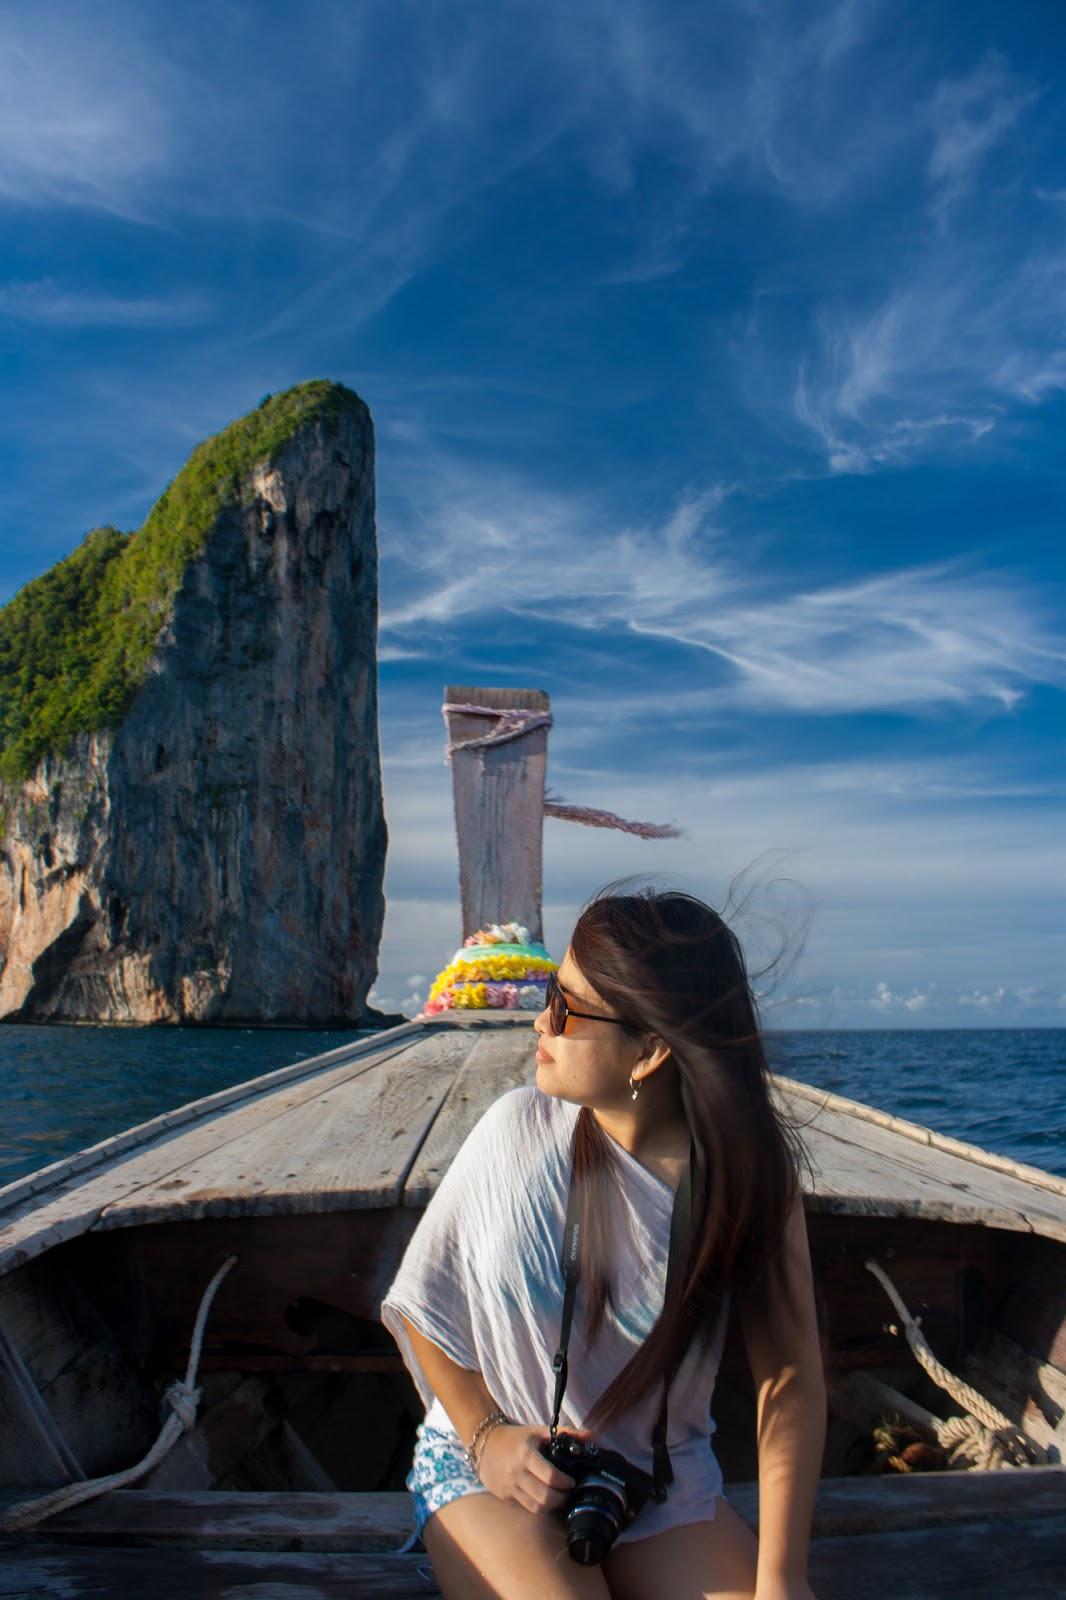 enroute to Maya Bay